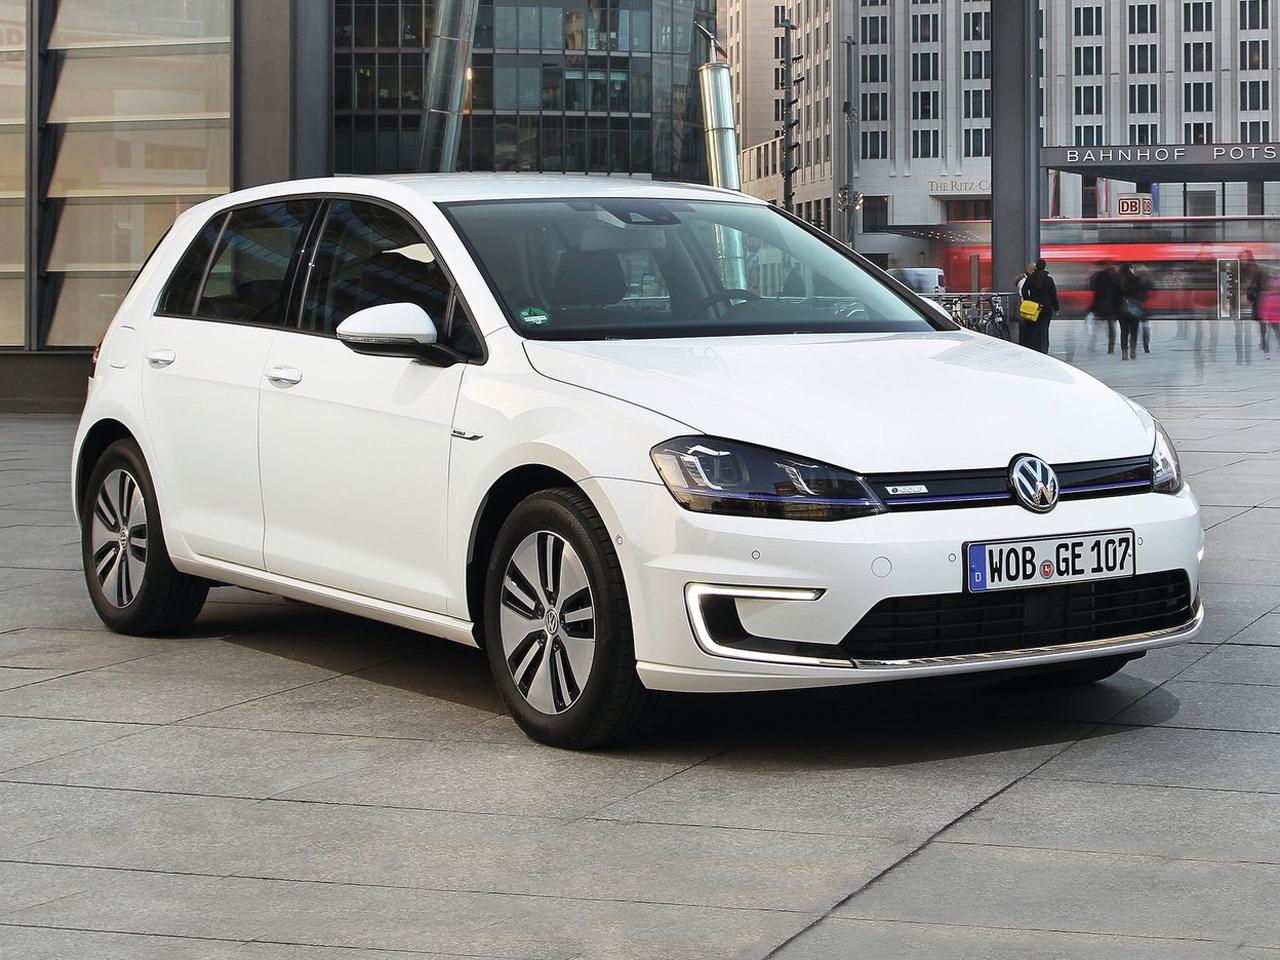 Ford Smart Mobility >> Volkswagen e-Golf 2014 EV -- Autobild.es